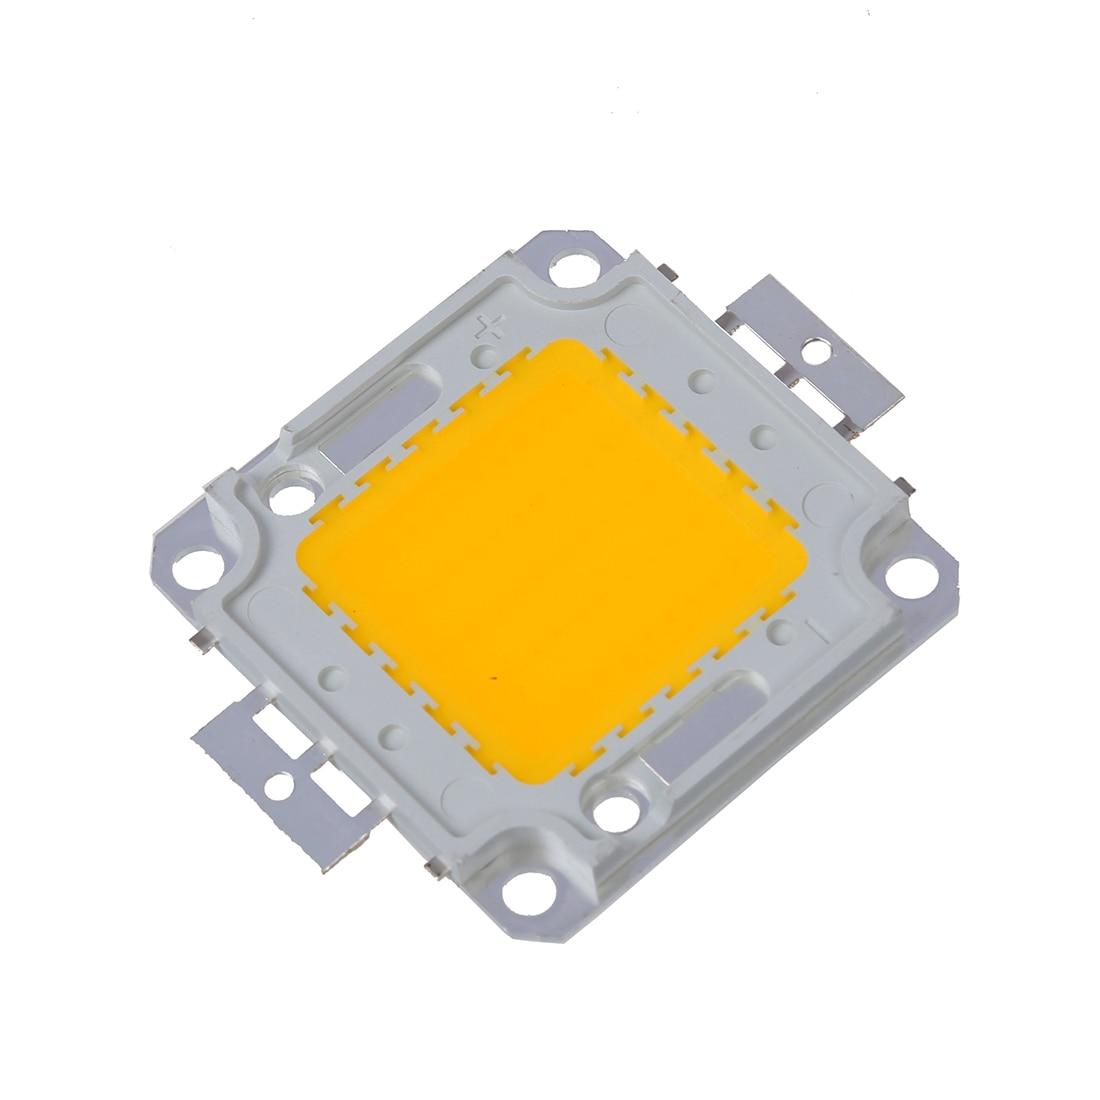 50W LED SMD Flood Light Warm White RGB Outdoor Garden Lamp Slim